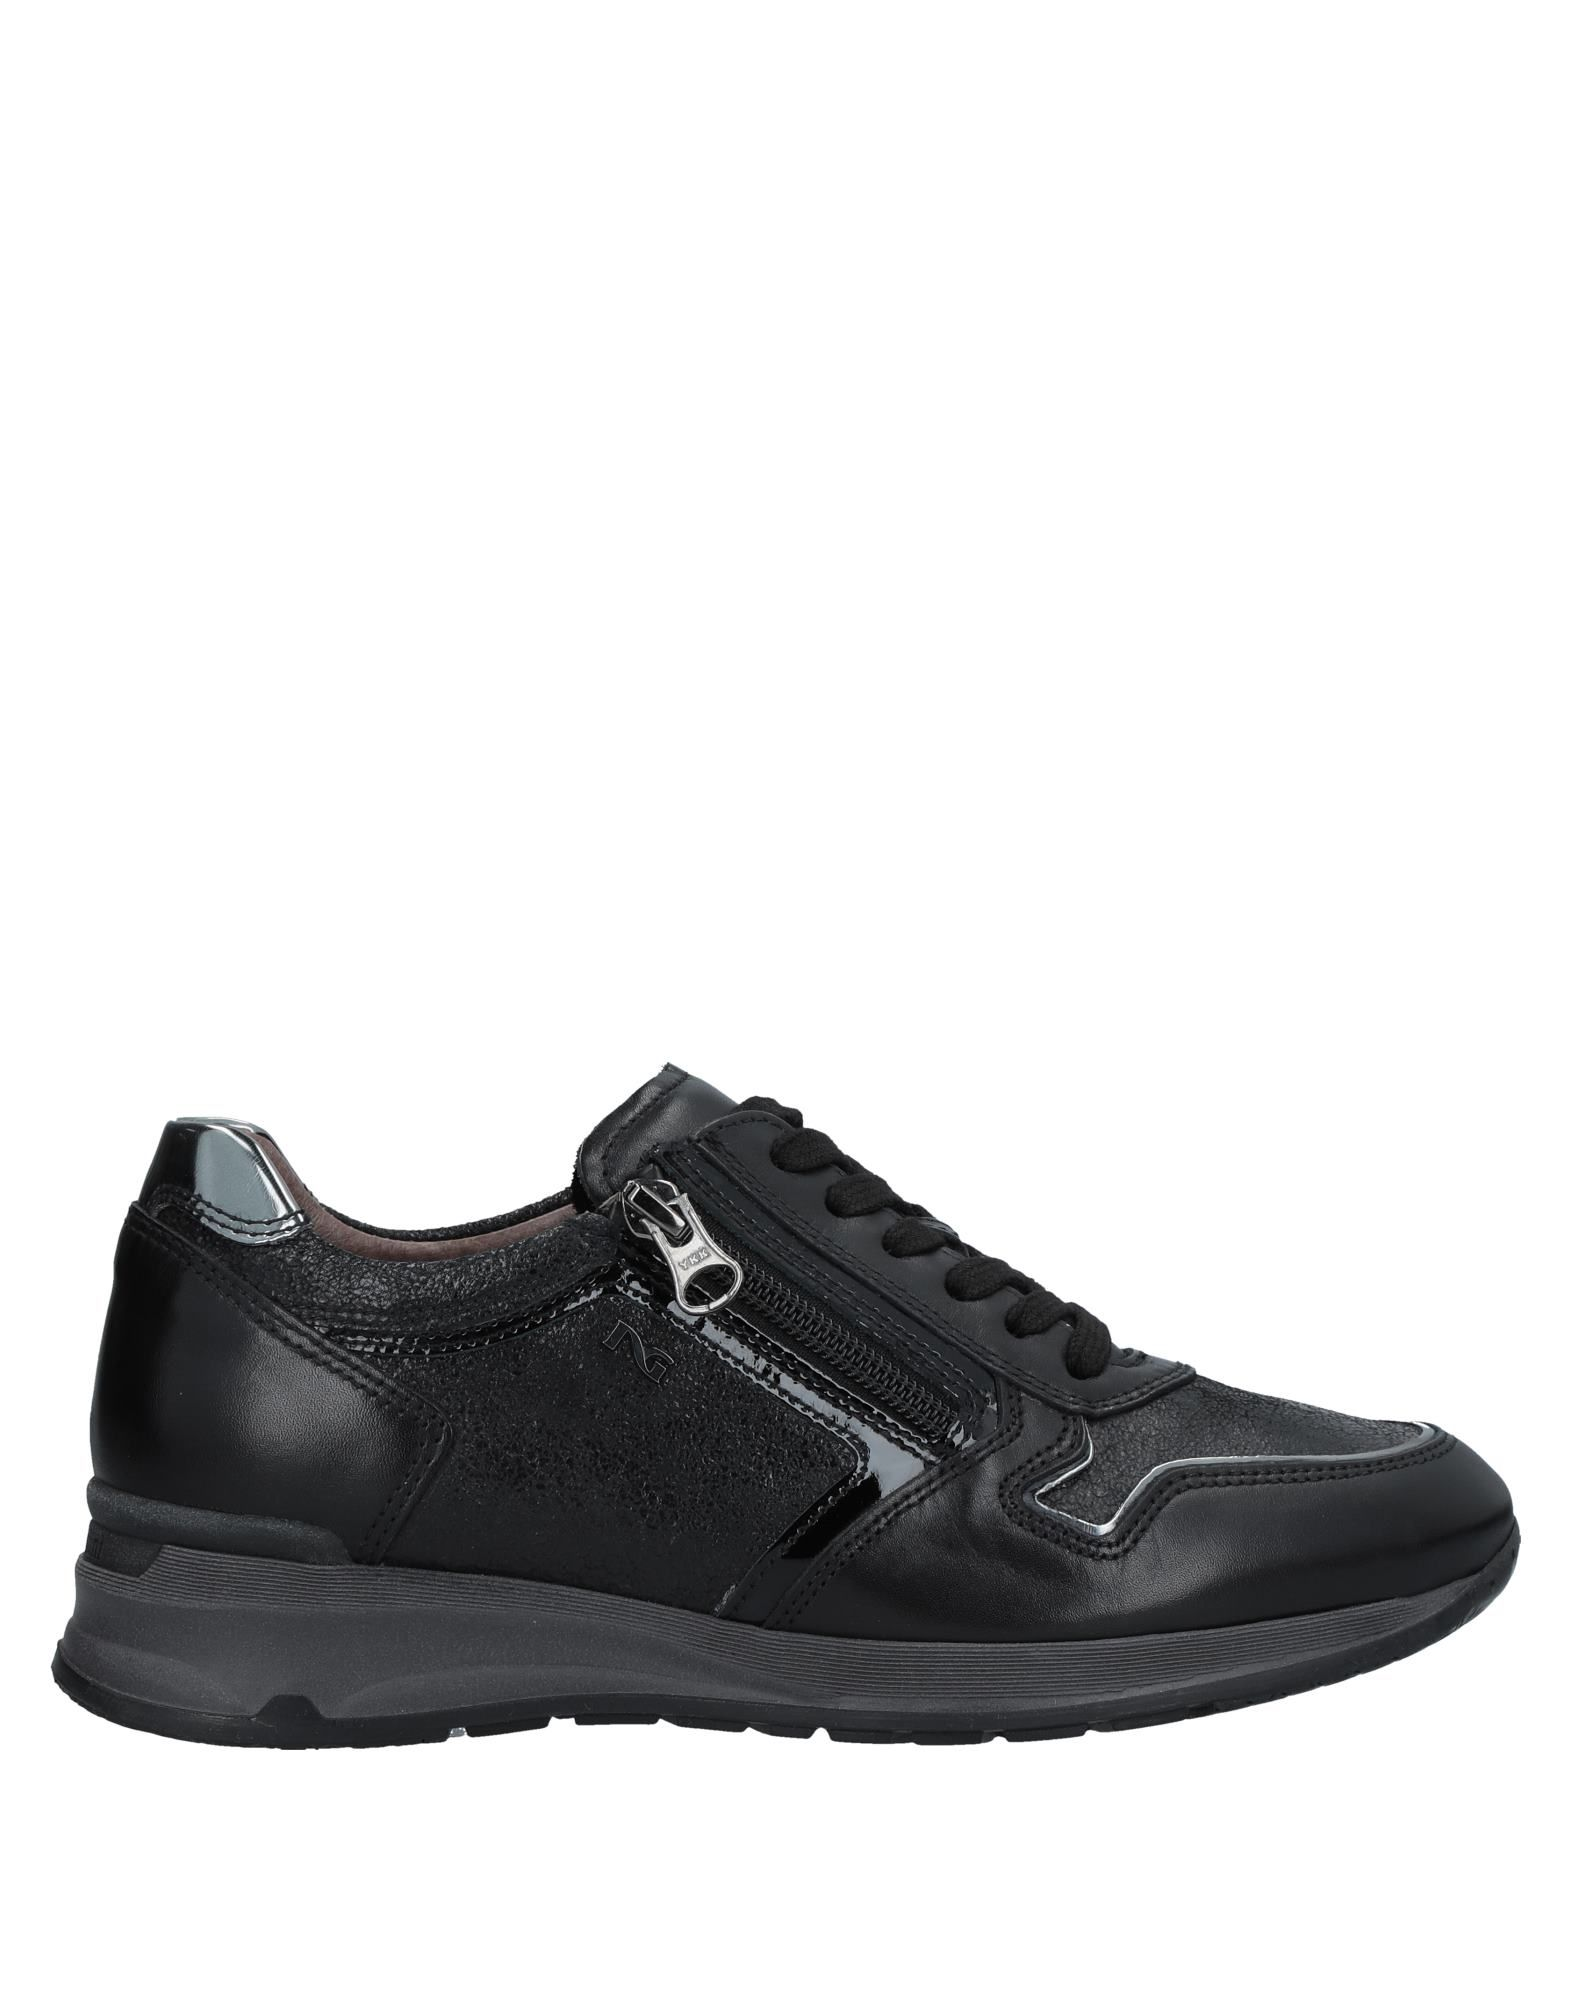 Nero  Giardini Sneakers Damen  Nero 11529827OQ Gute Qualität beliebte Schuhe 4b3a8c